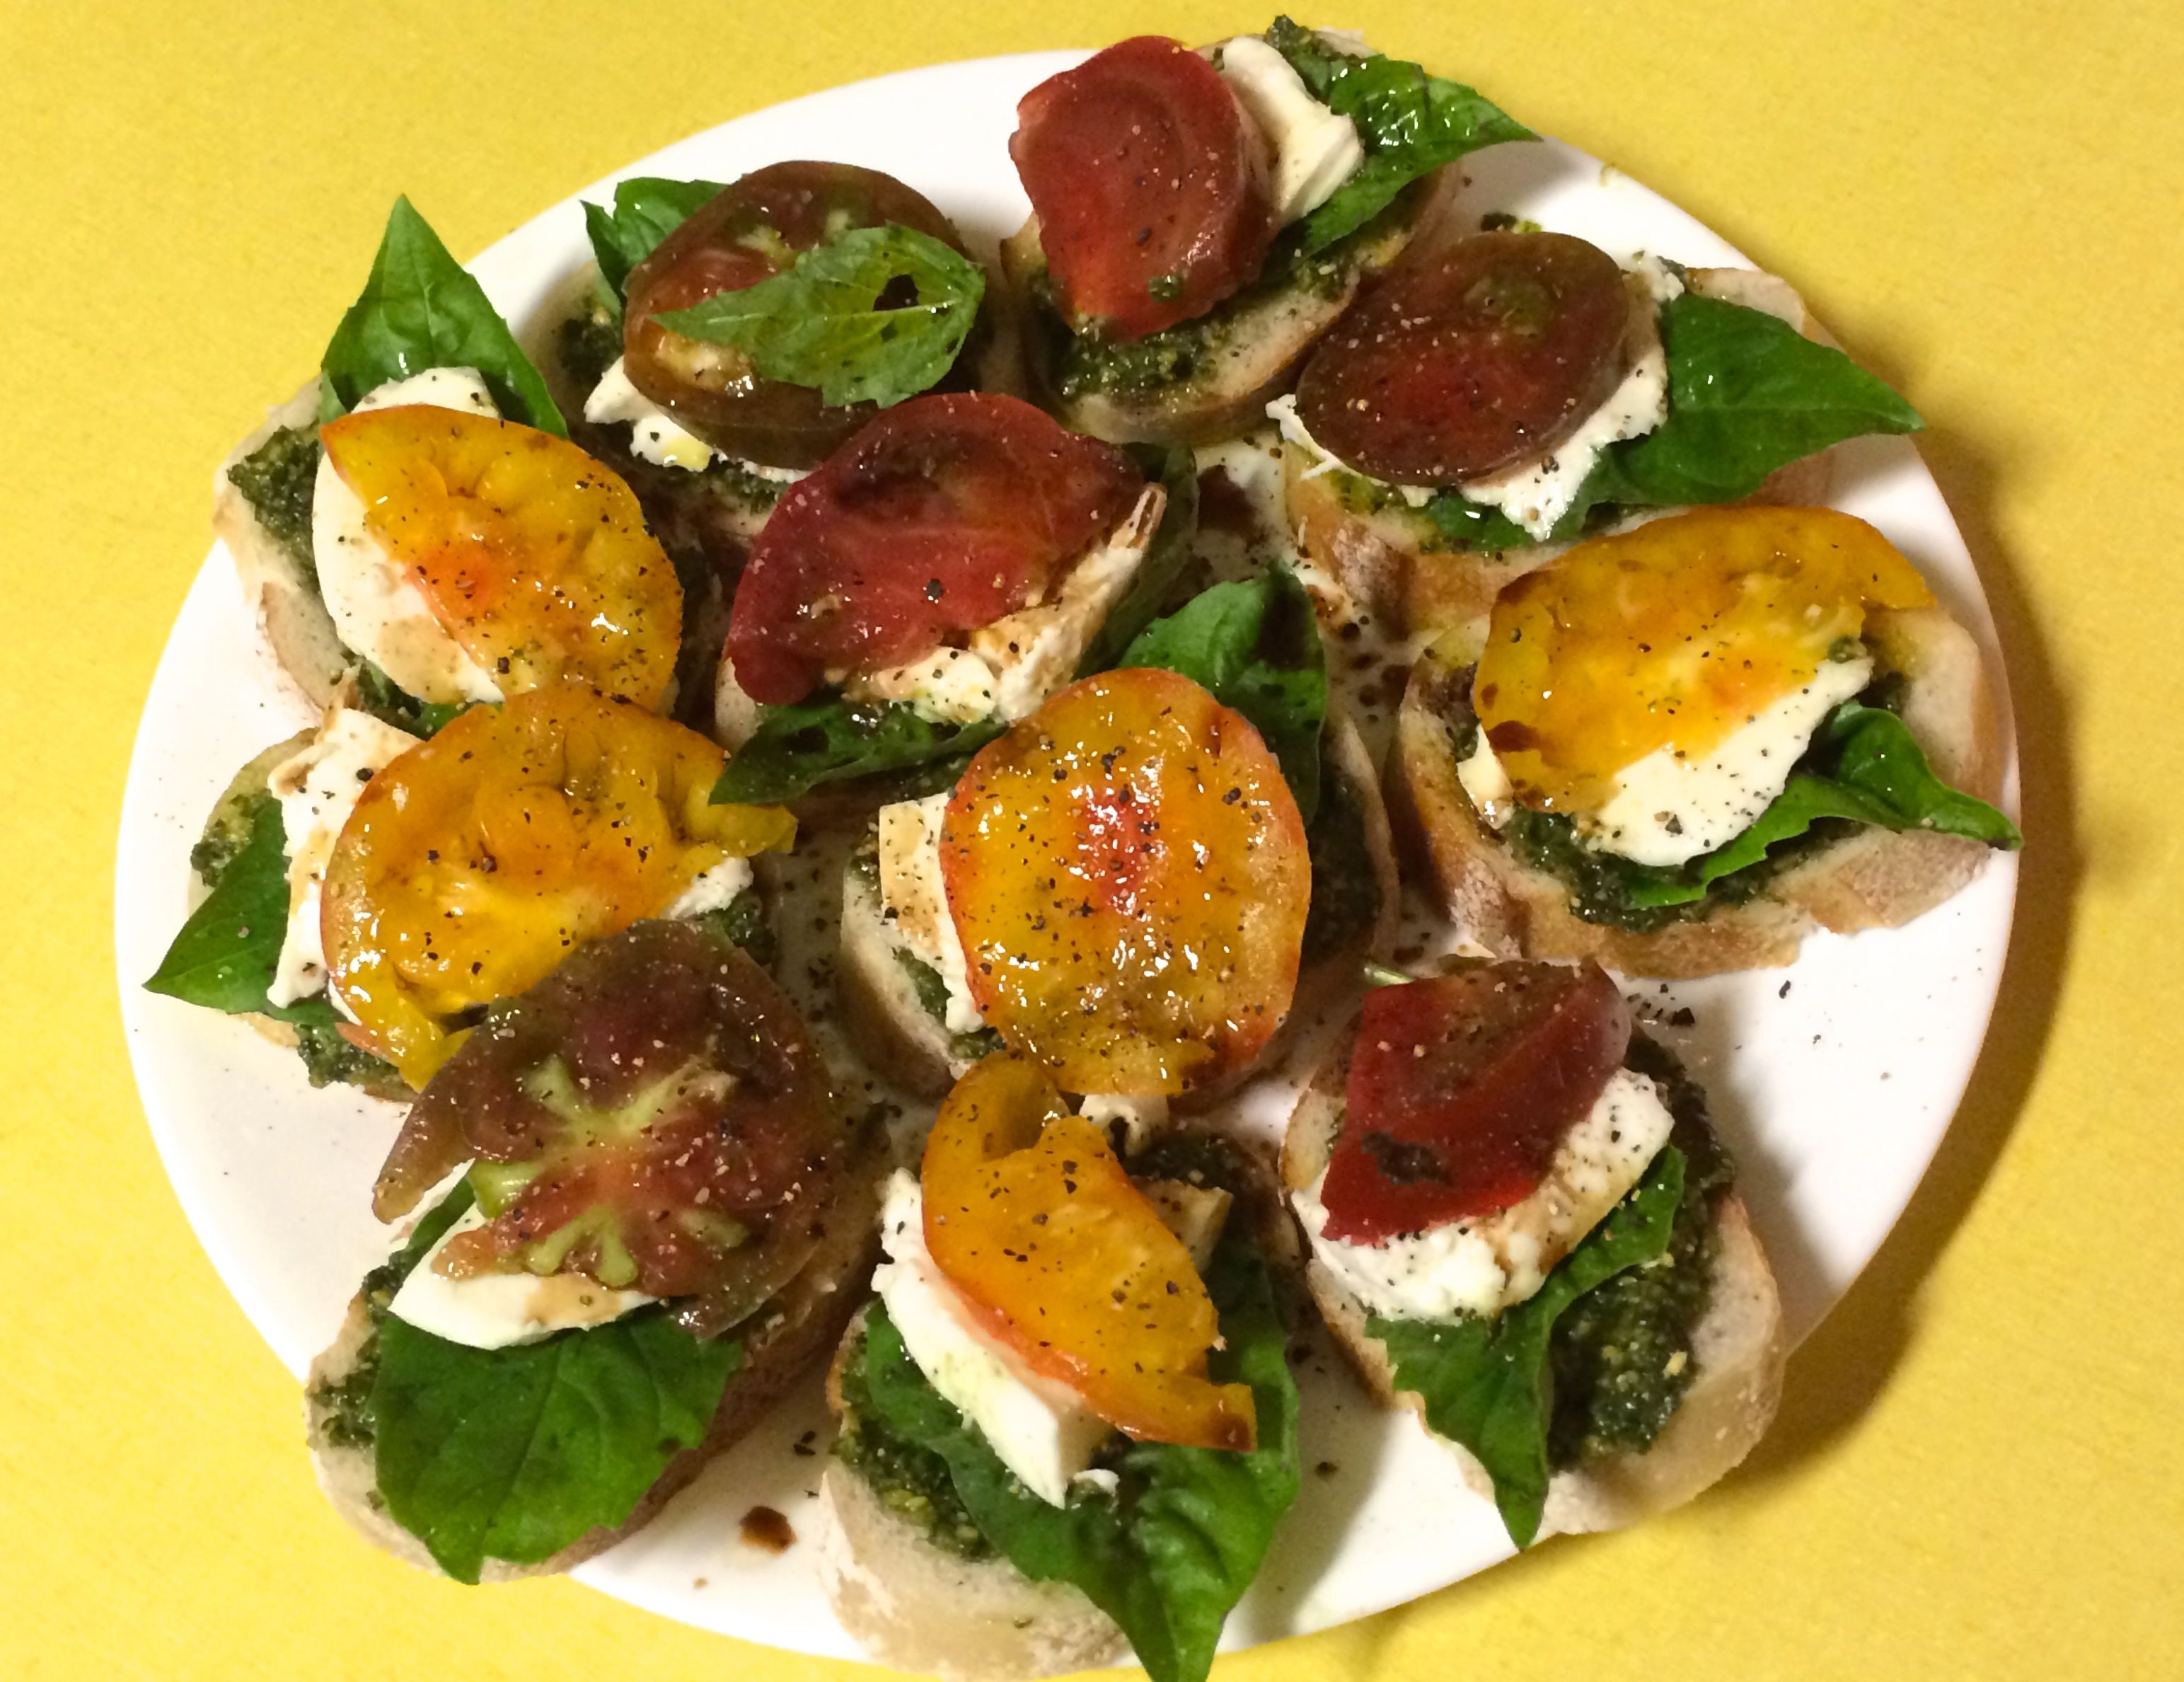 Heirloom Tomato and Pesto Sandwich